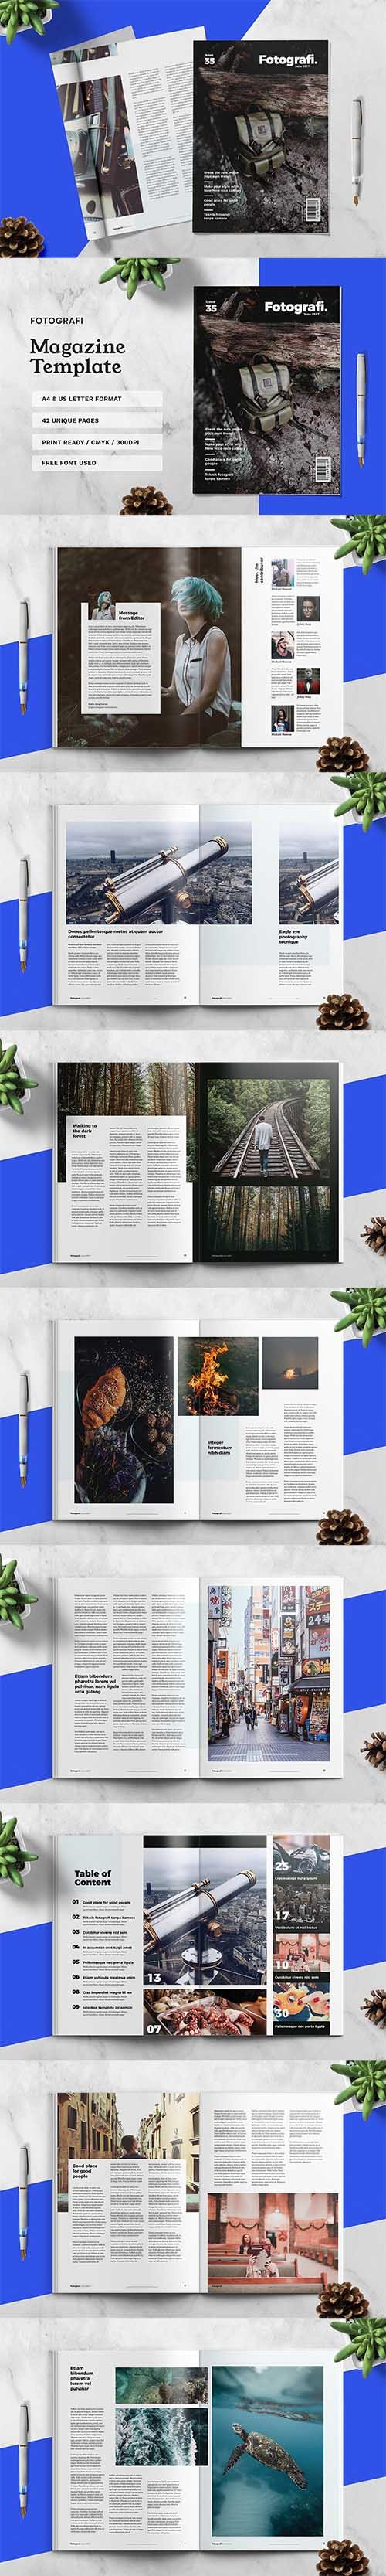 FOTOGRAFI - Magazine Template